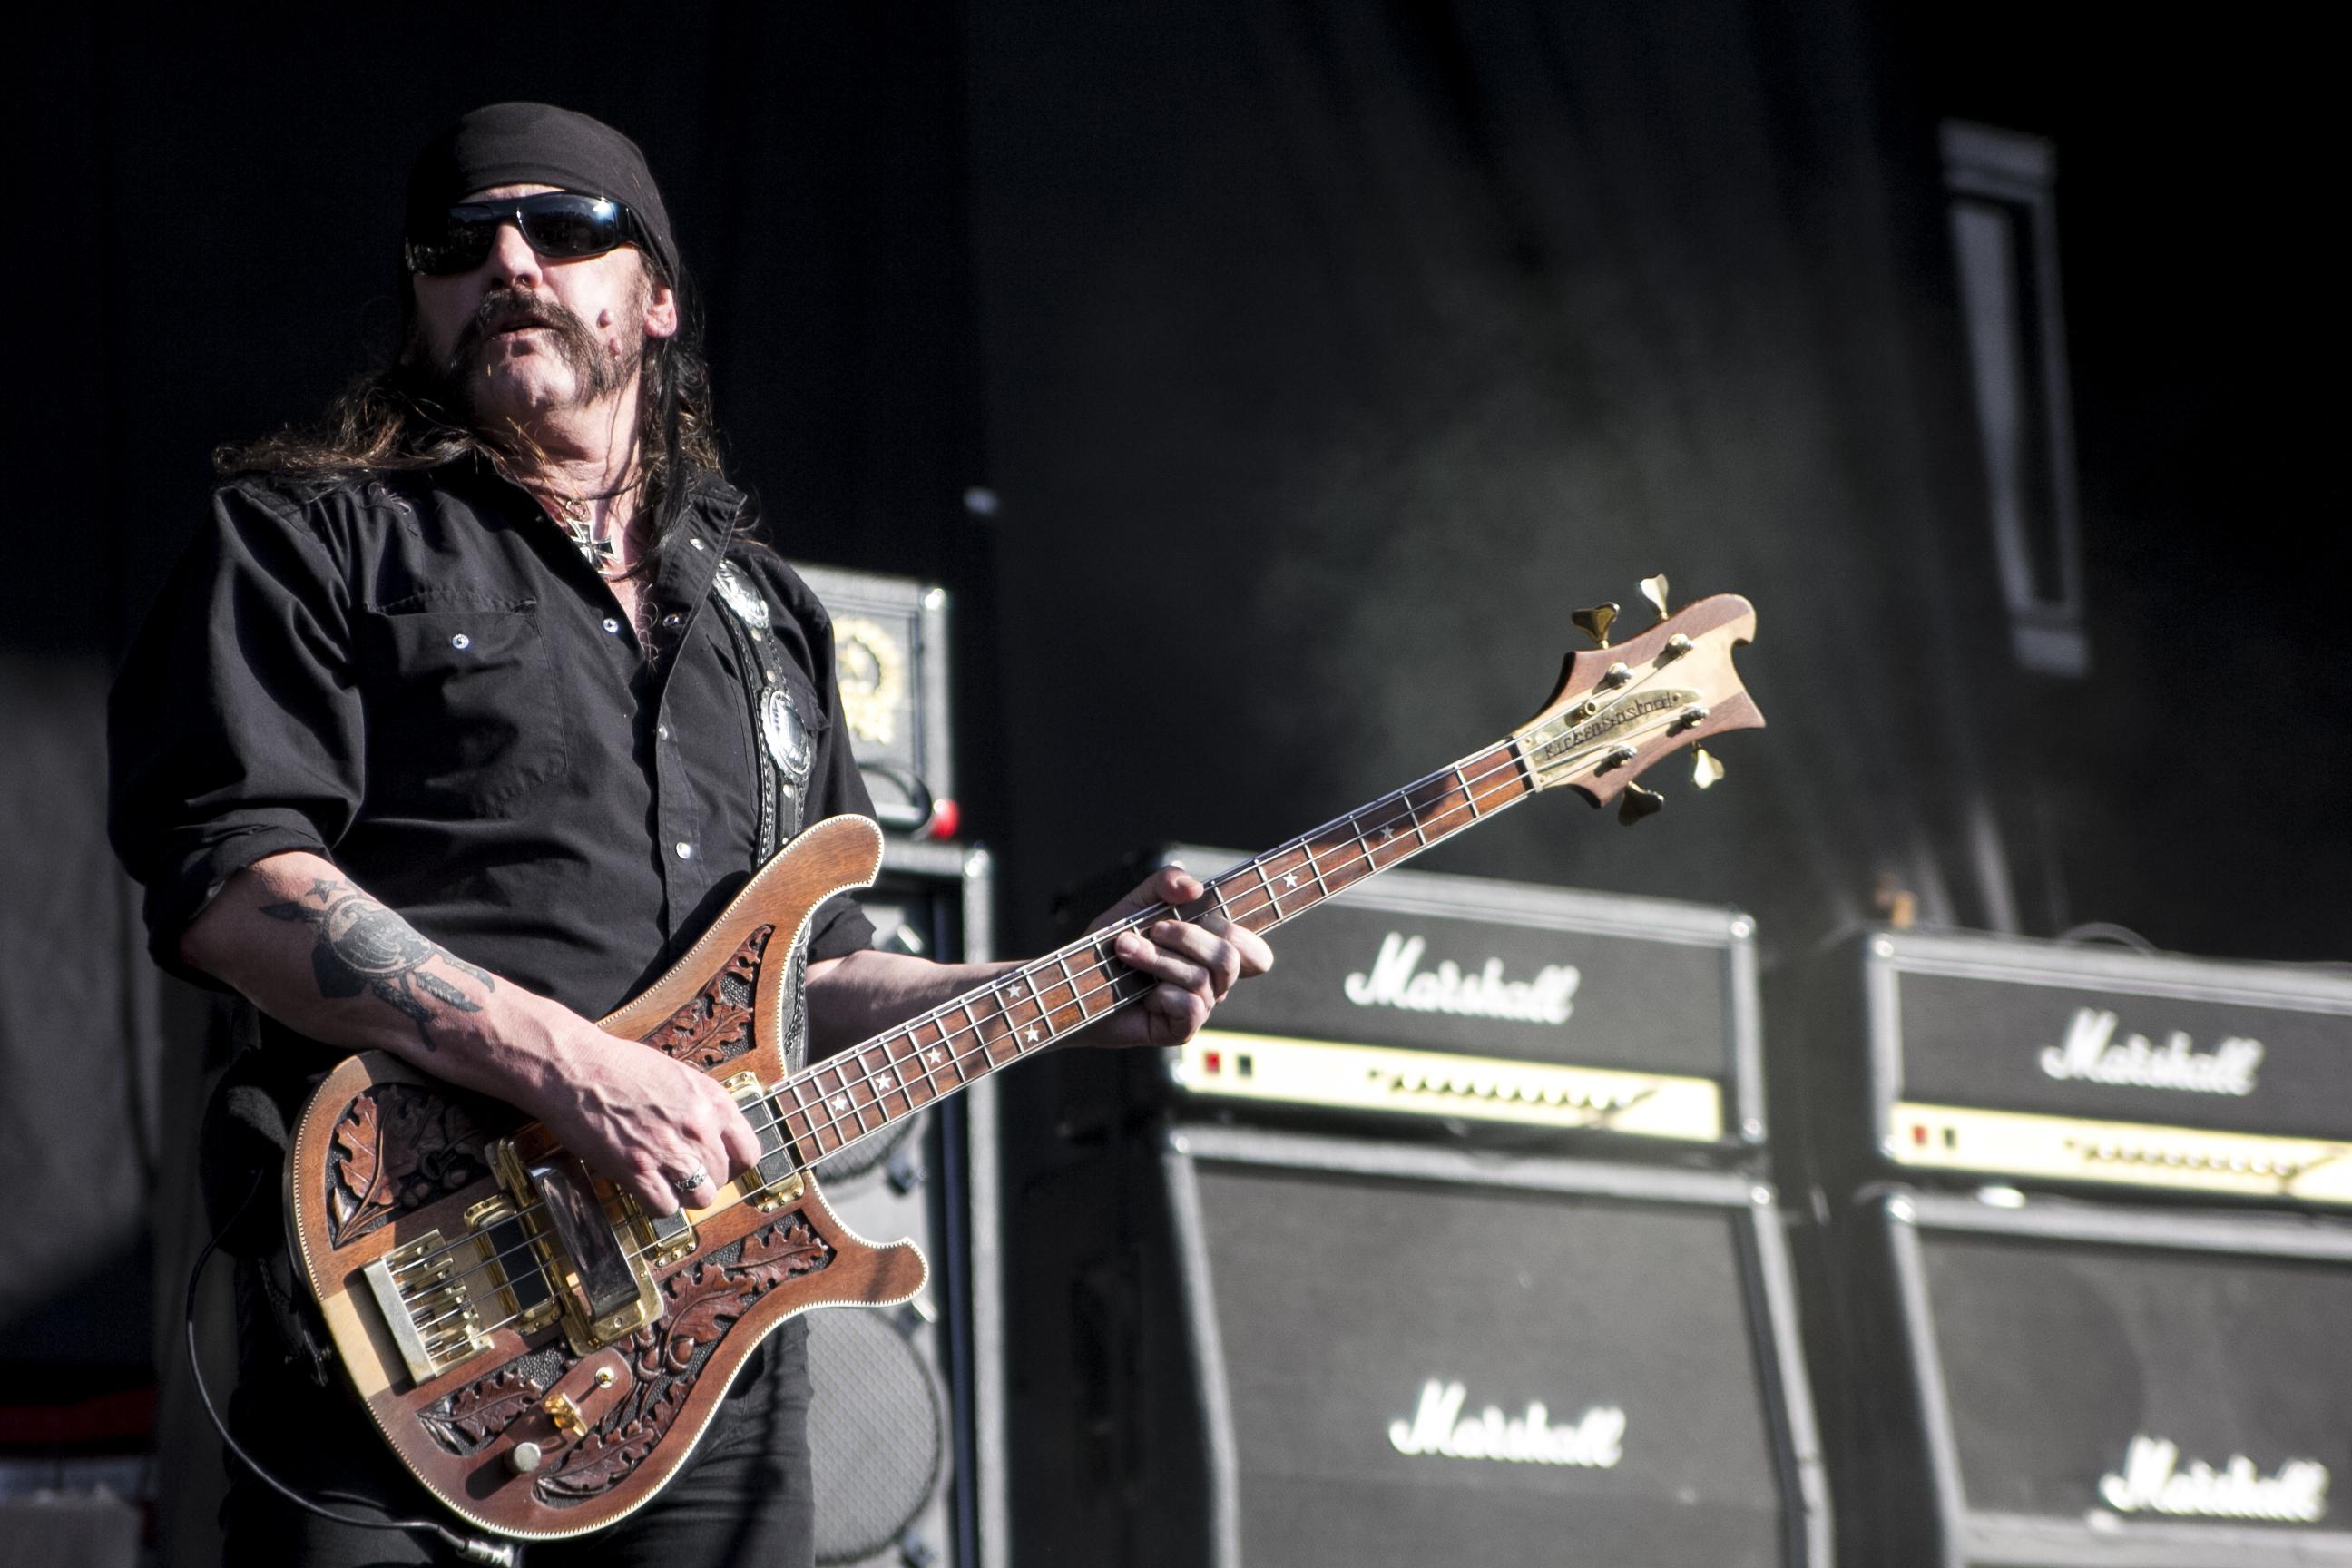 Lemmy Kilmister Rock Music Motorhead Wallpaper Hd: MOTORHEAD Heavy Metal Hard Rock Guitar Guitars Concert